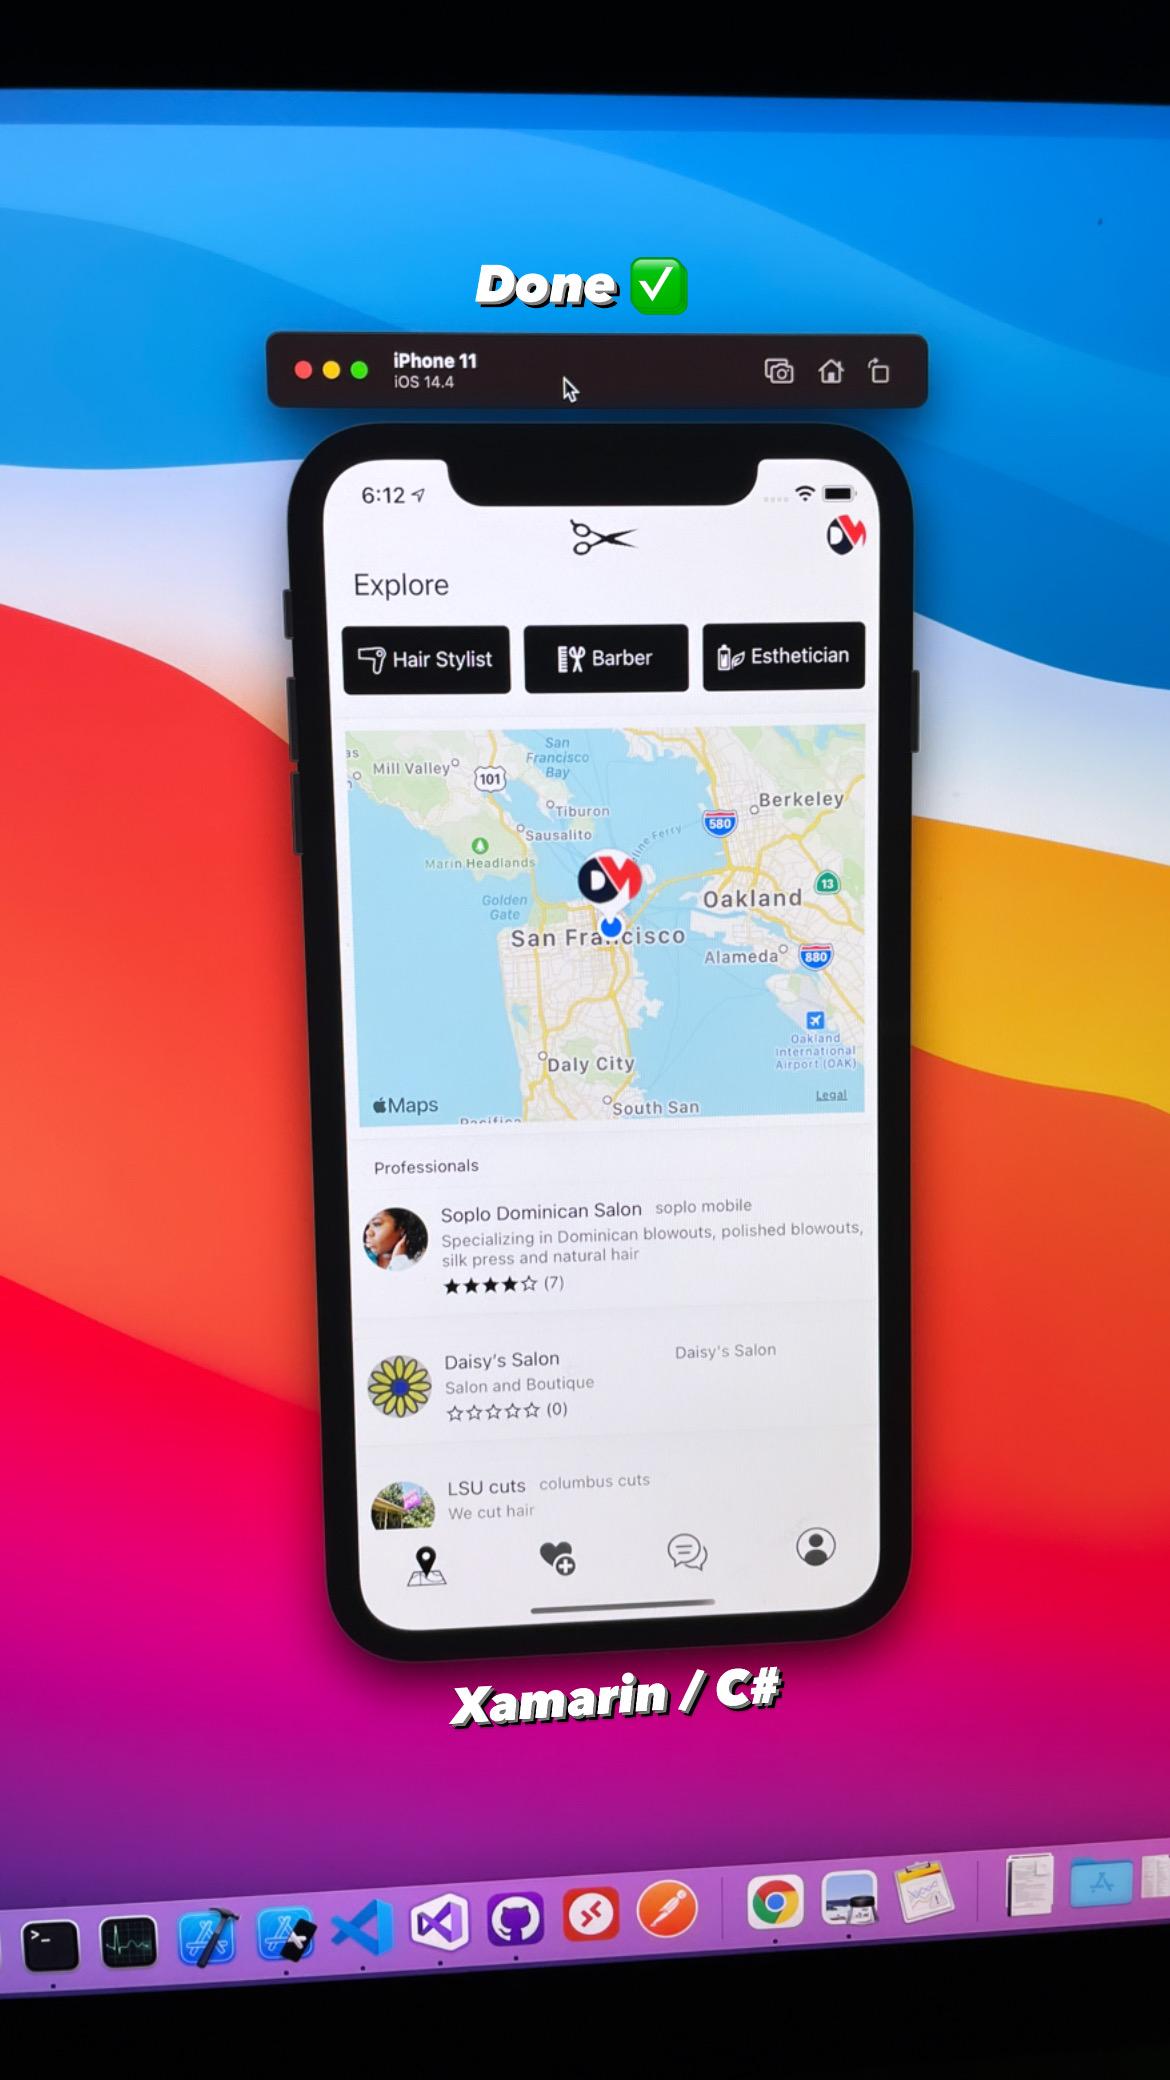 Xamarin mobile app called Cut Corners